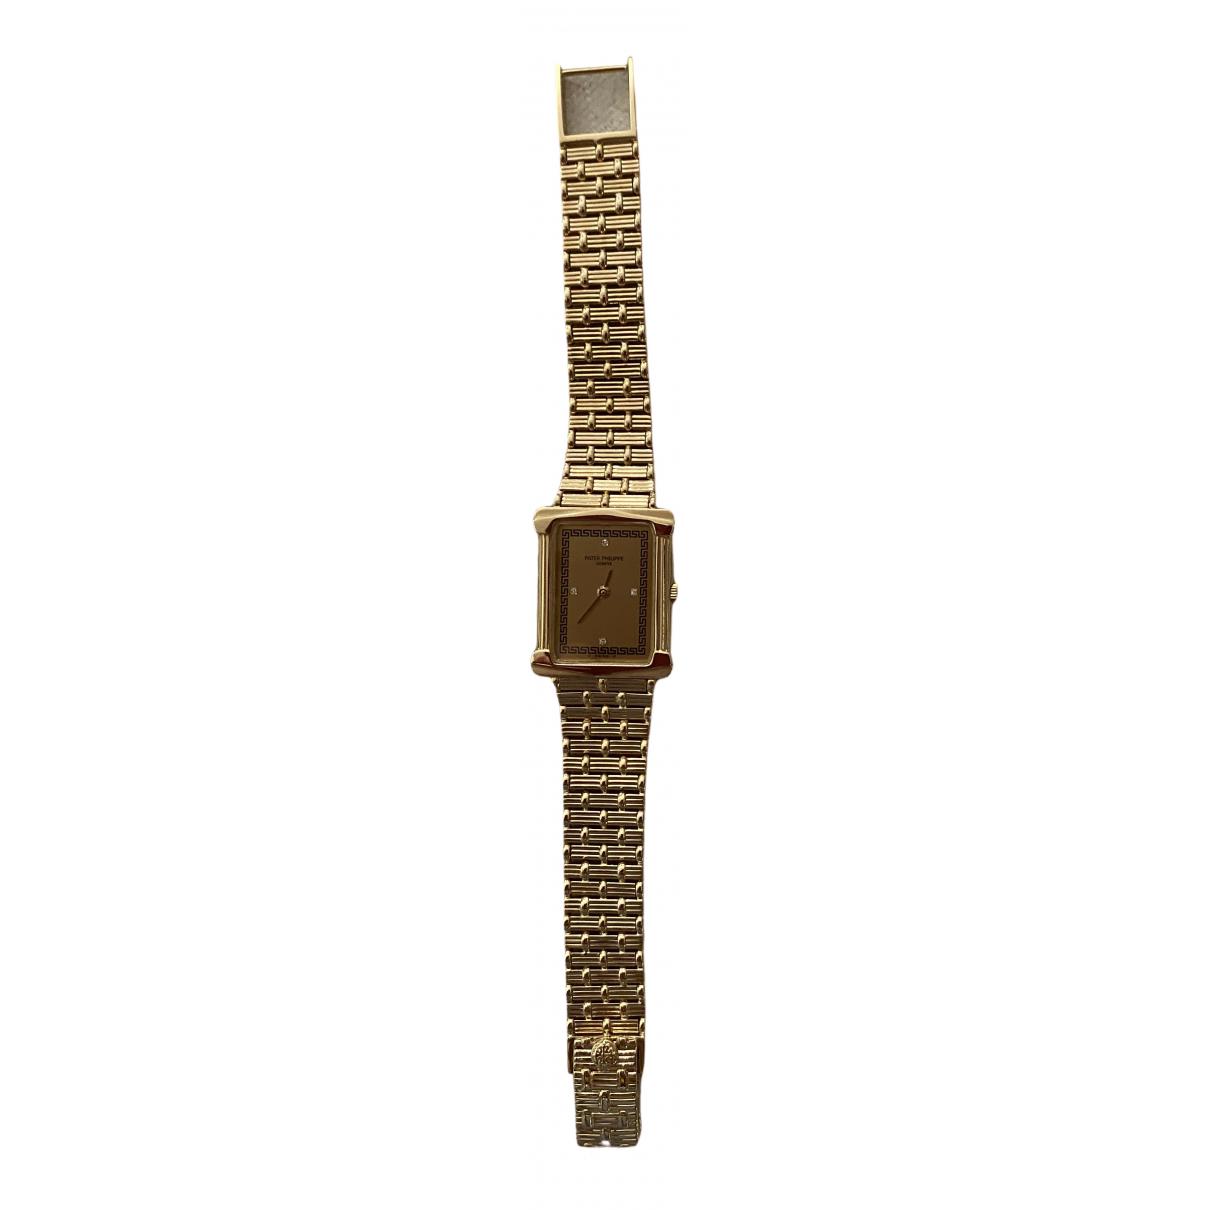 Patek Philippe Gondolo Uhr in  Gold Gelbgold